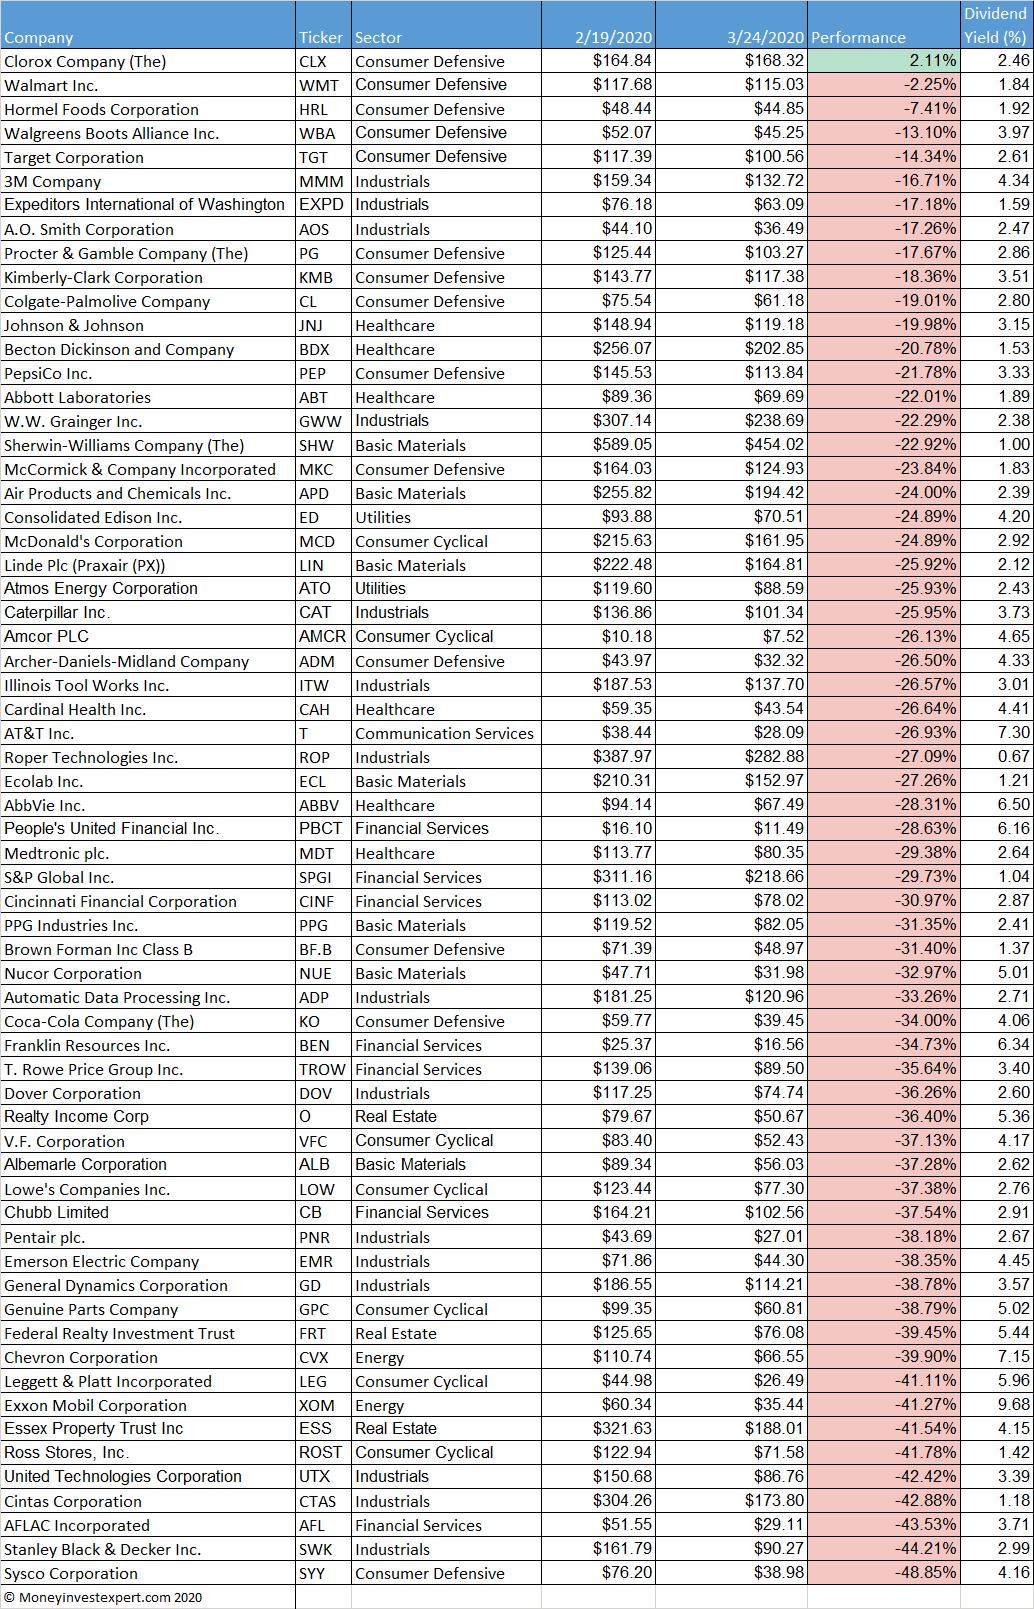 corona-performance-dividend-aristocrats